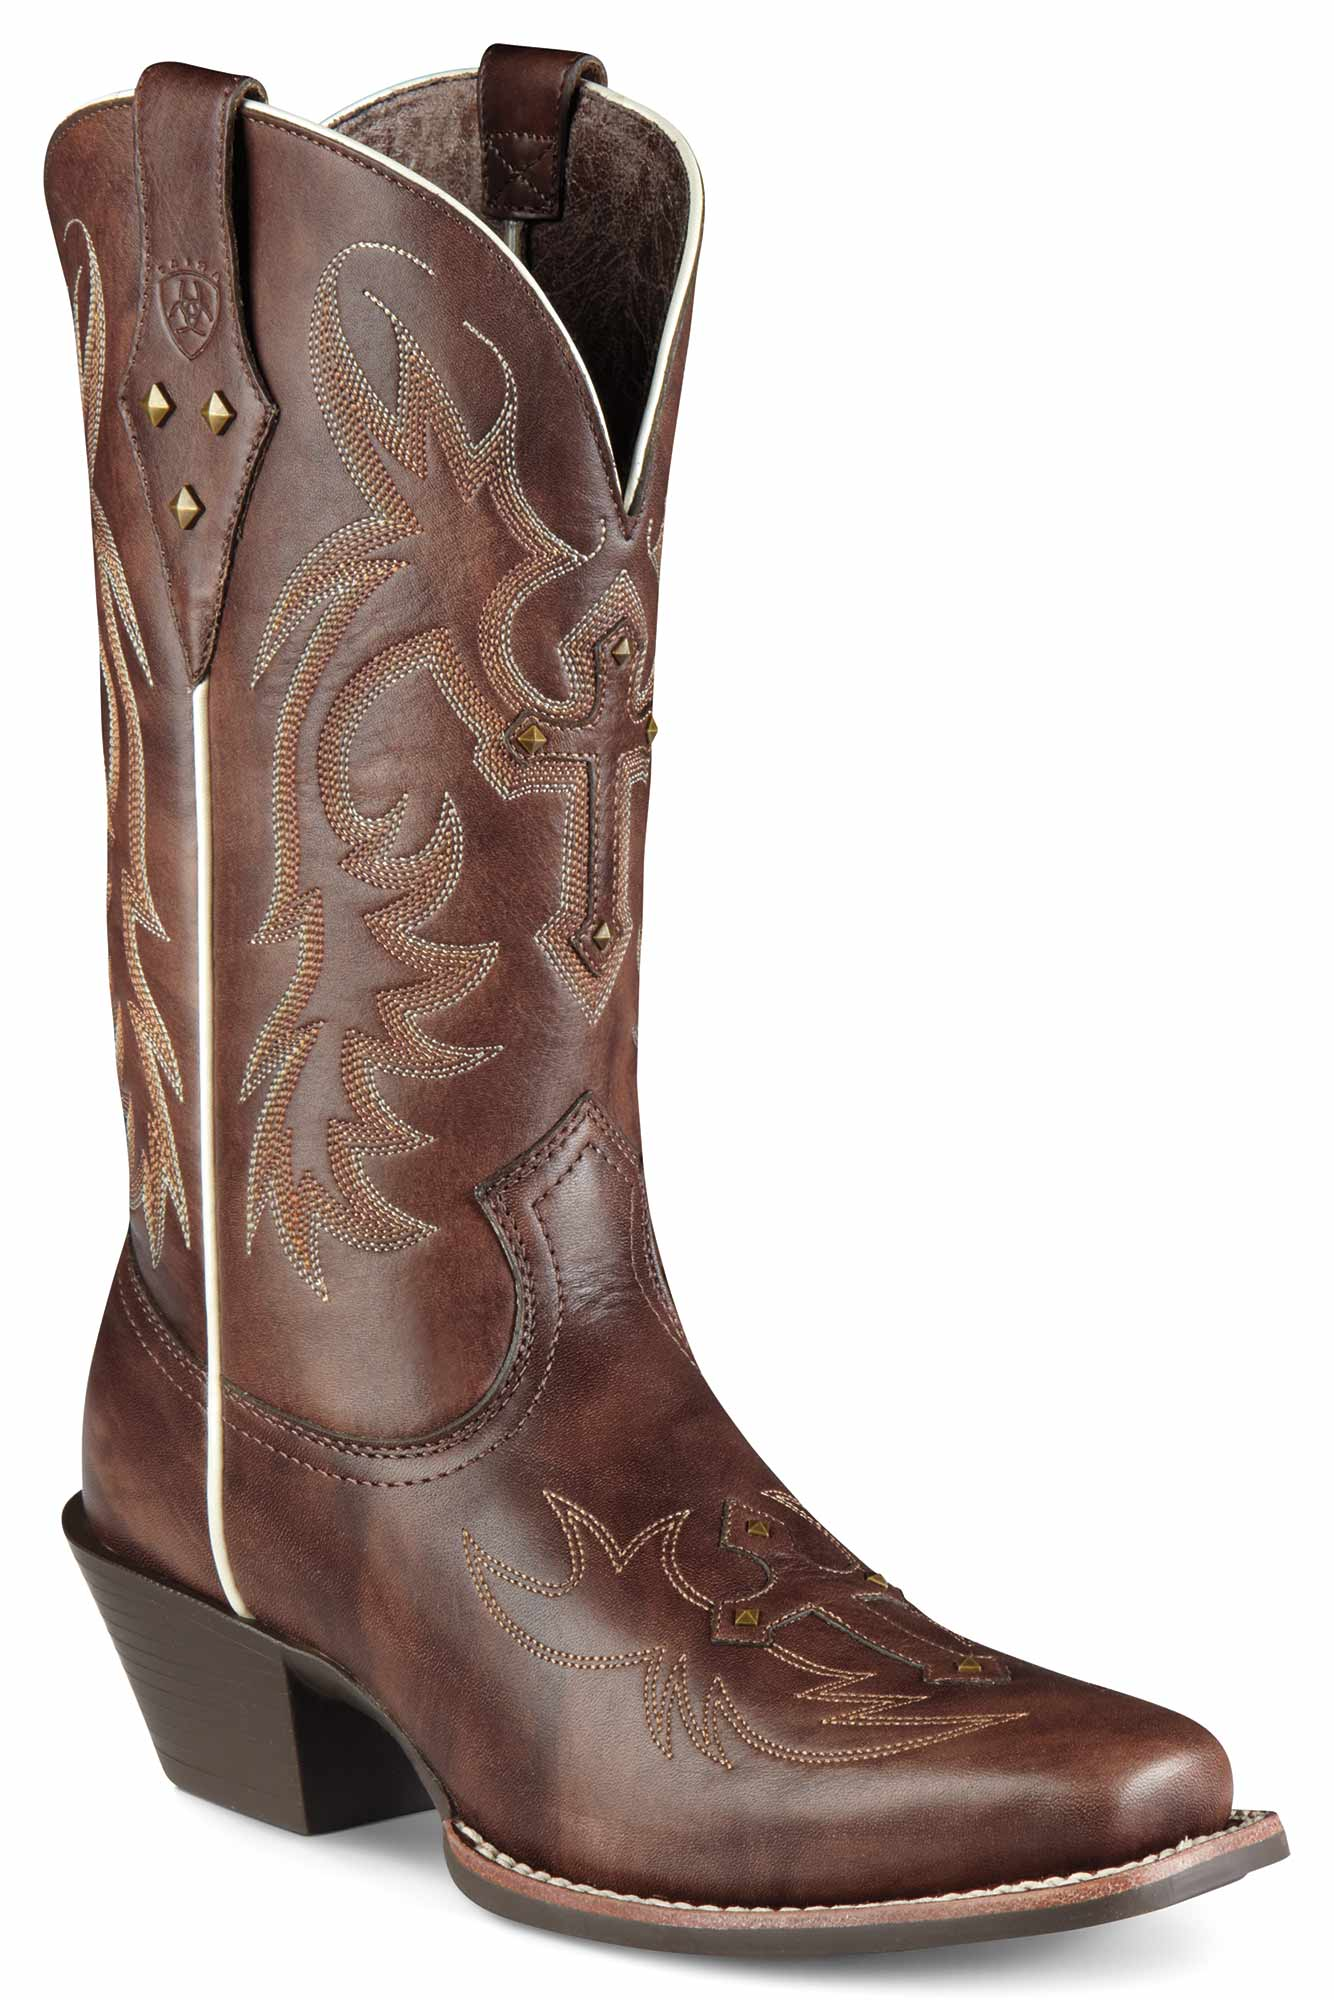 a761d8edcc2 Ariat Western Boots Women's Legend Spirit Yukon Brown with Cross Overlay